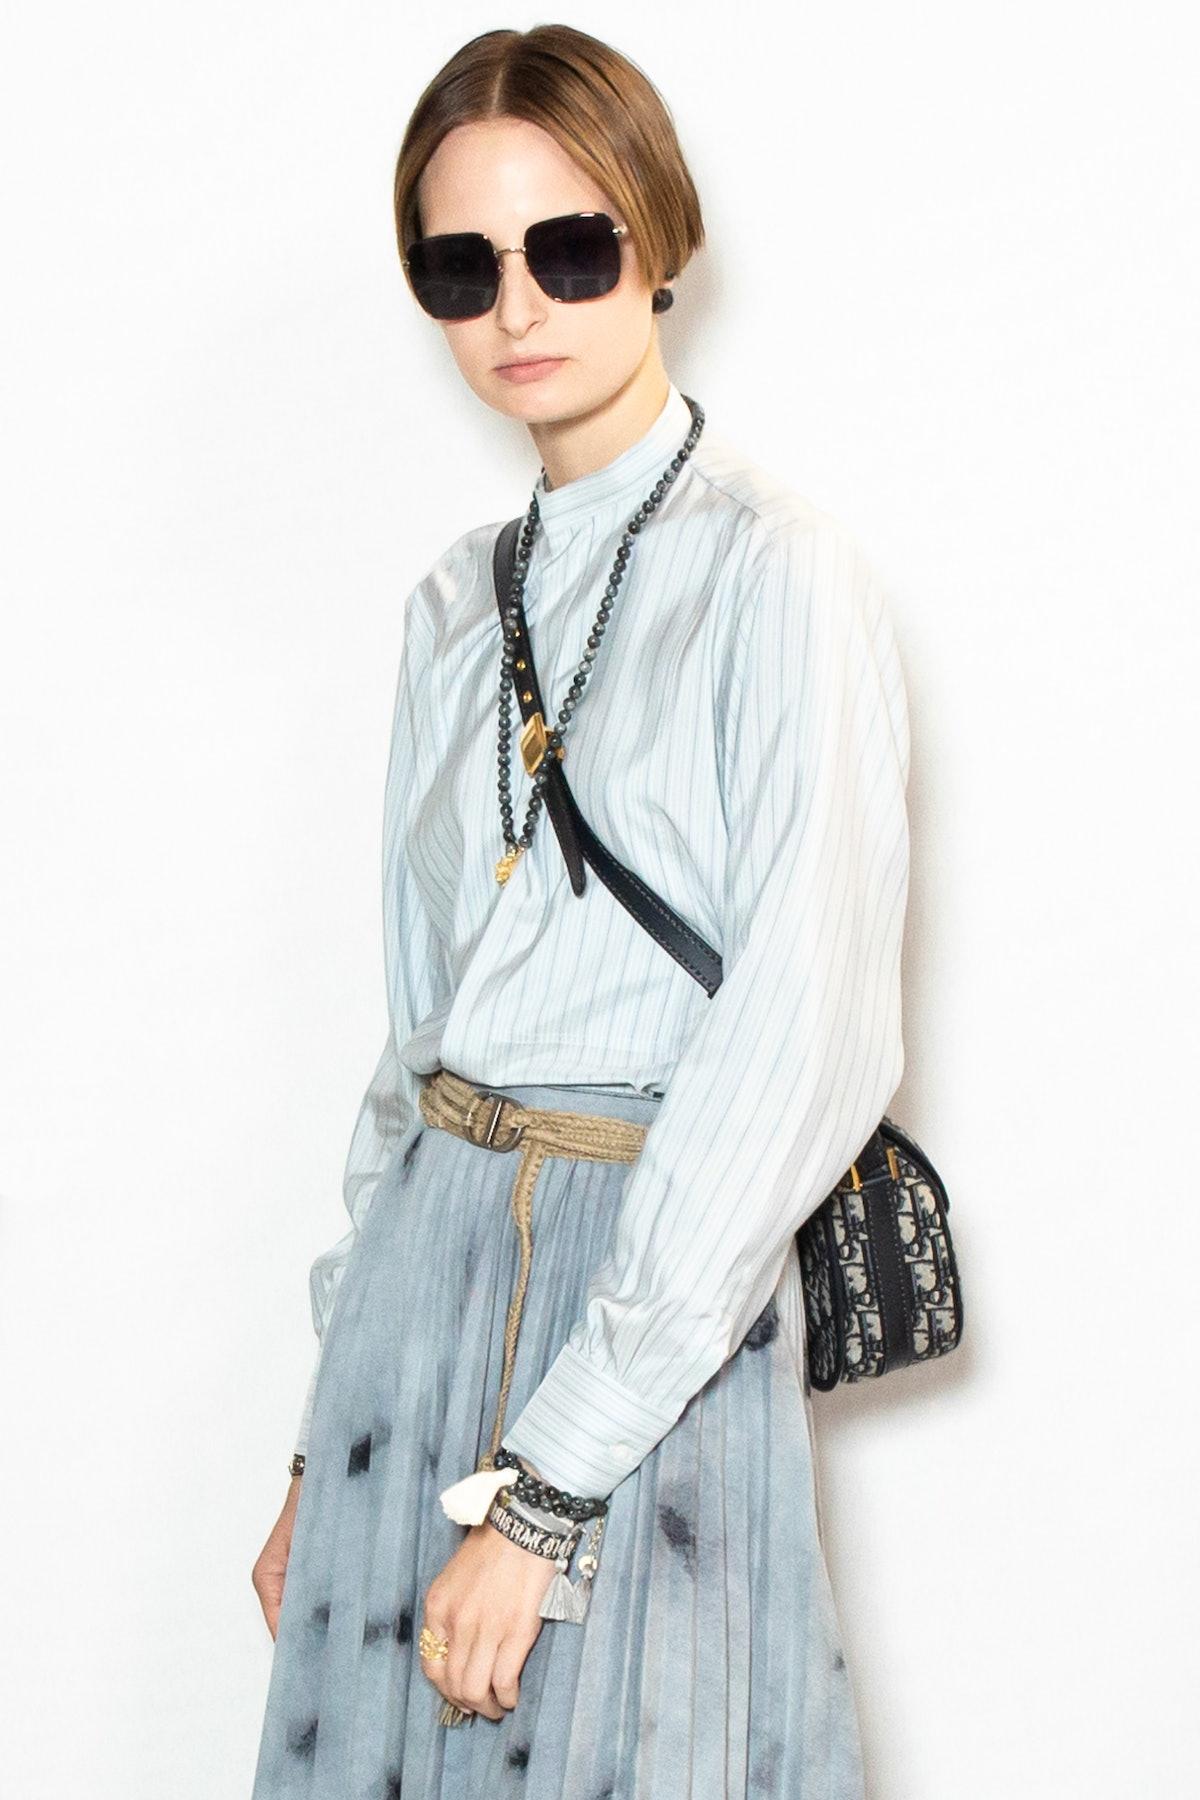 Serichai_Dior_BTS-058.jpg